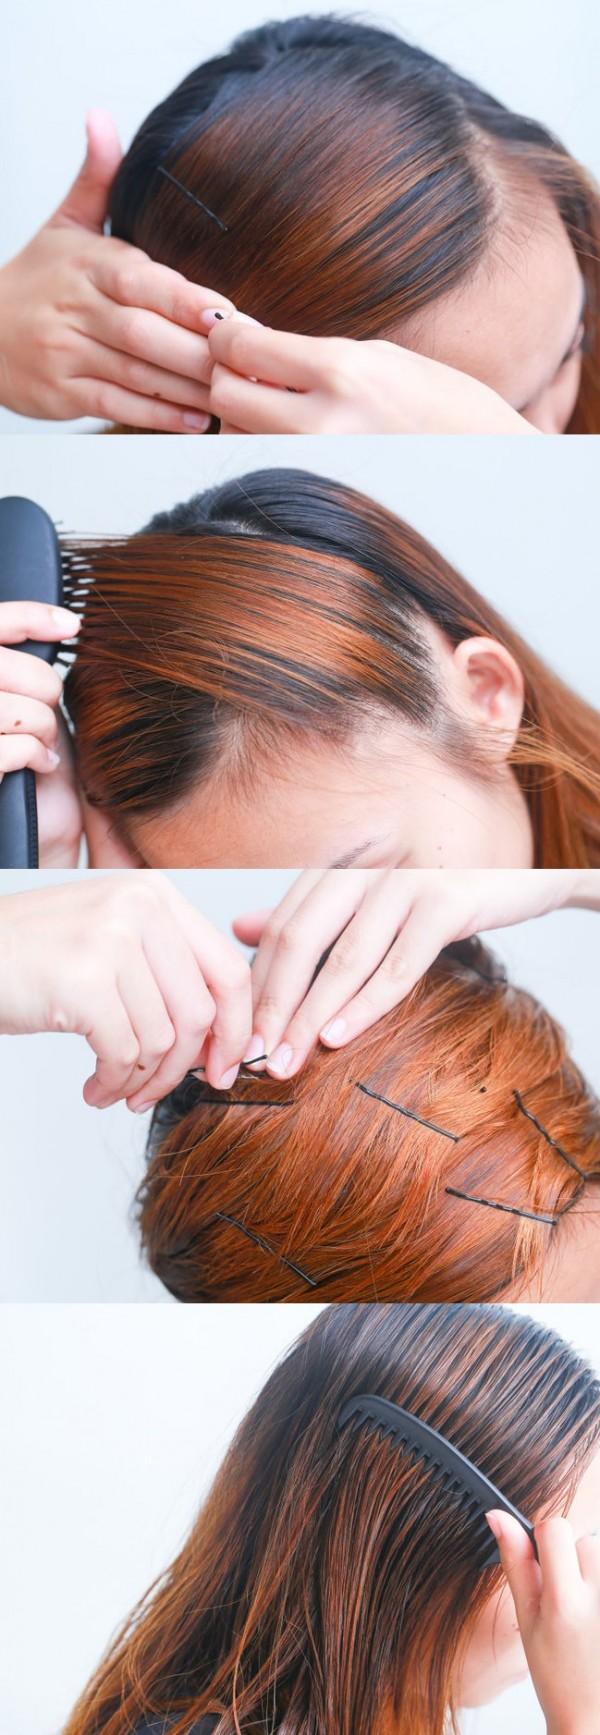 pines cabello